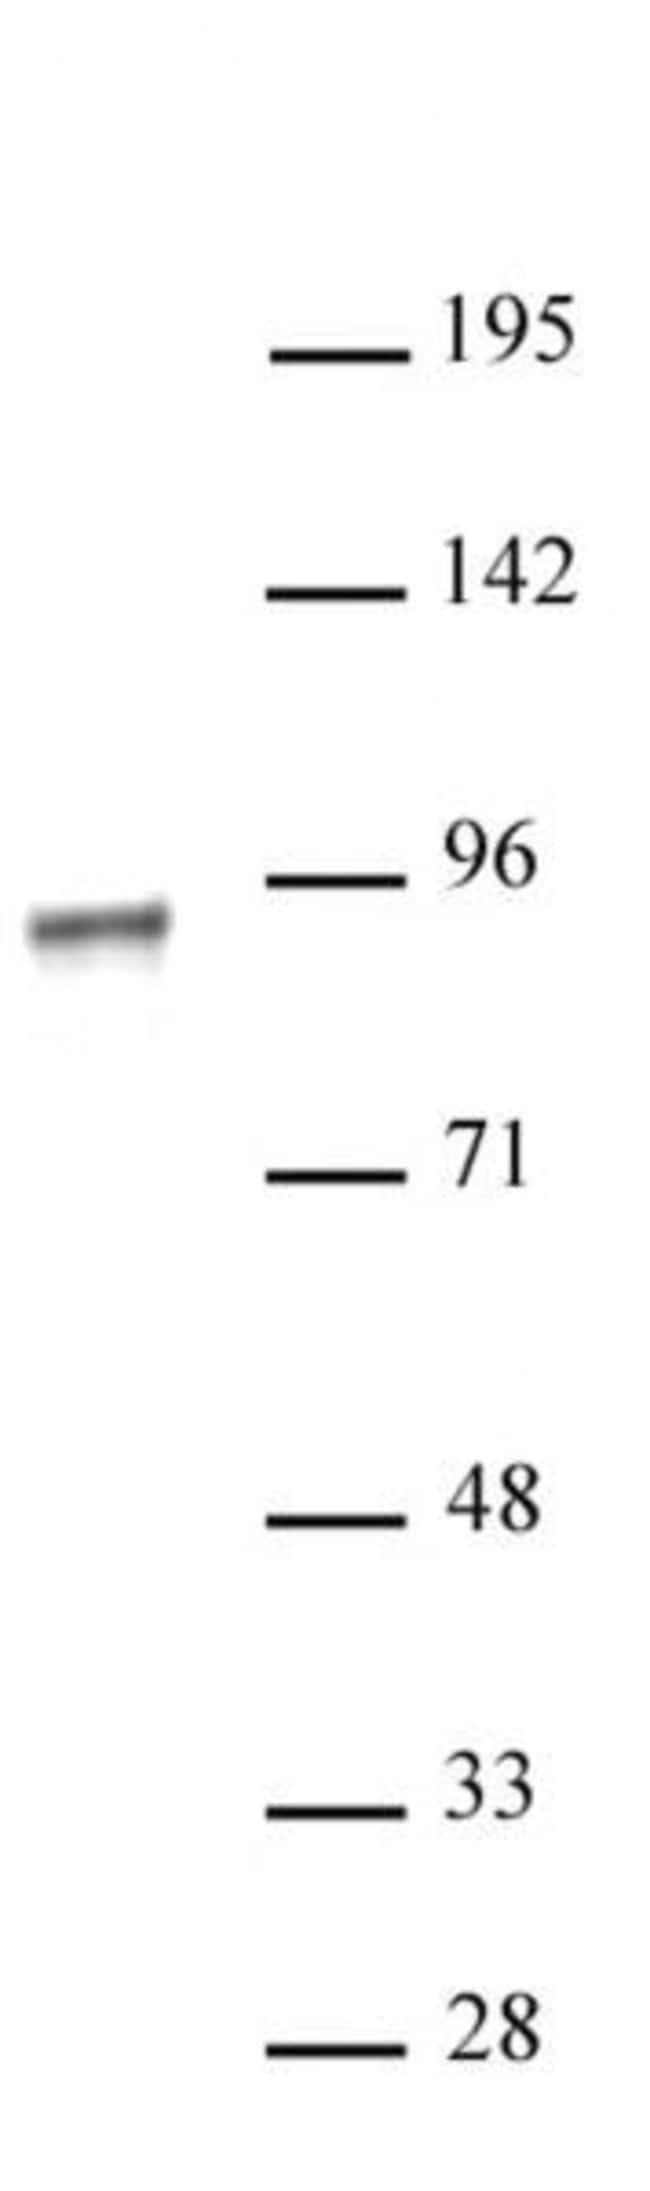 NR3C1 Rabbit anti-Human, Unconjugated, Polyclonal, Active Motif:Antibodies:Primary